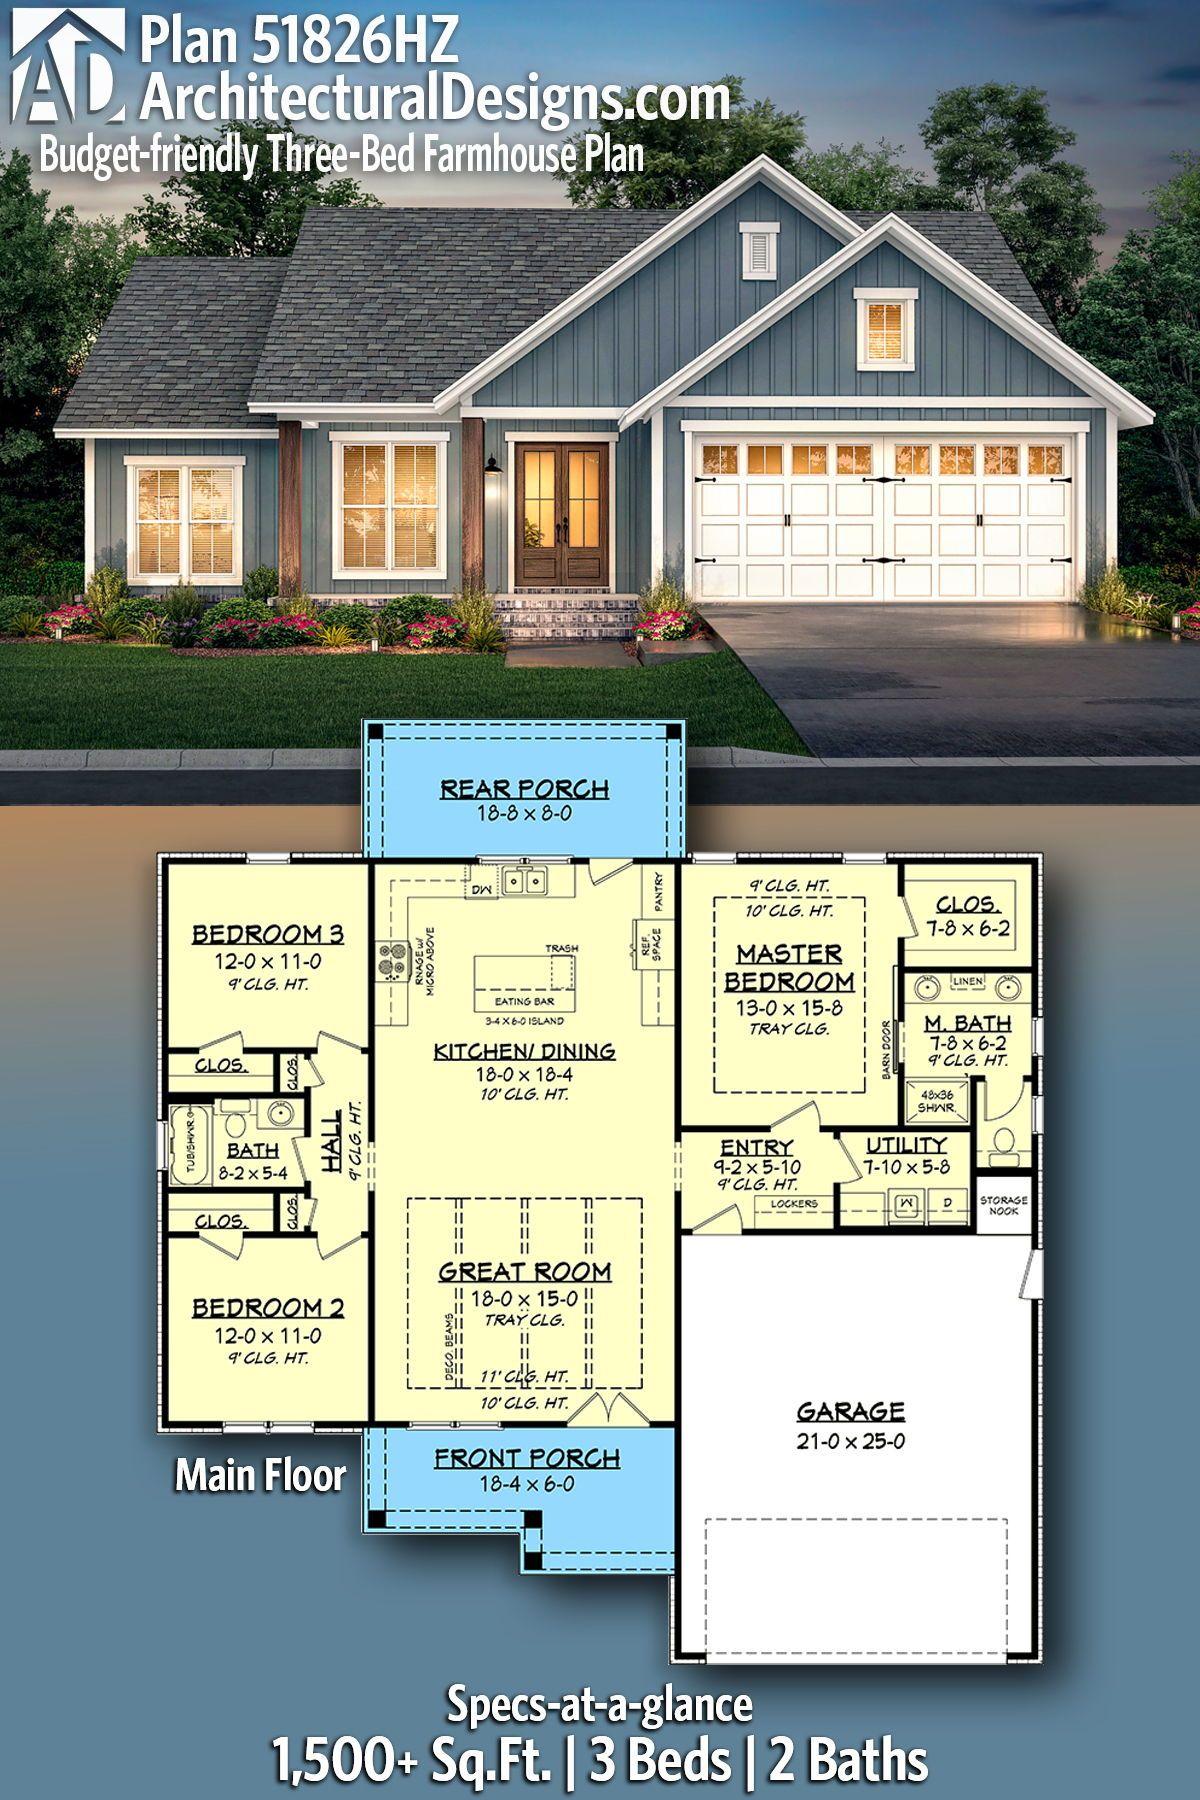 Plan 51826hz Budget Friendly Three Bed Farmhouse Plan In 2021 House Plans Farmhouse Family House Plans House Blueprints